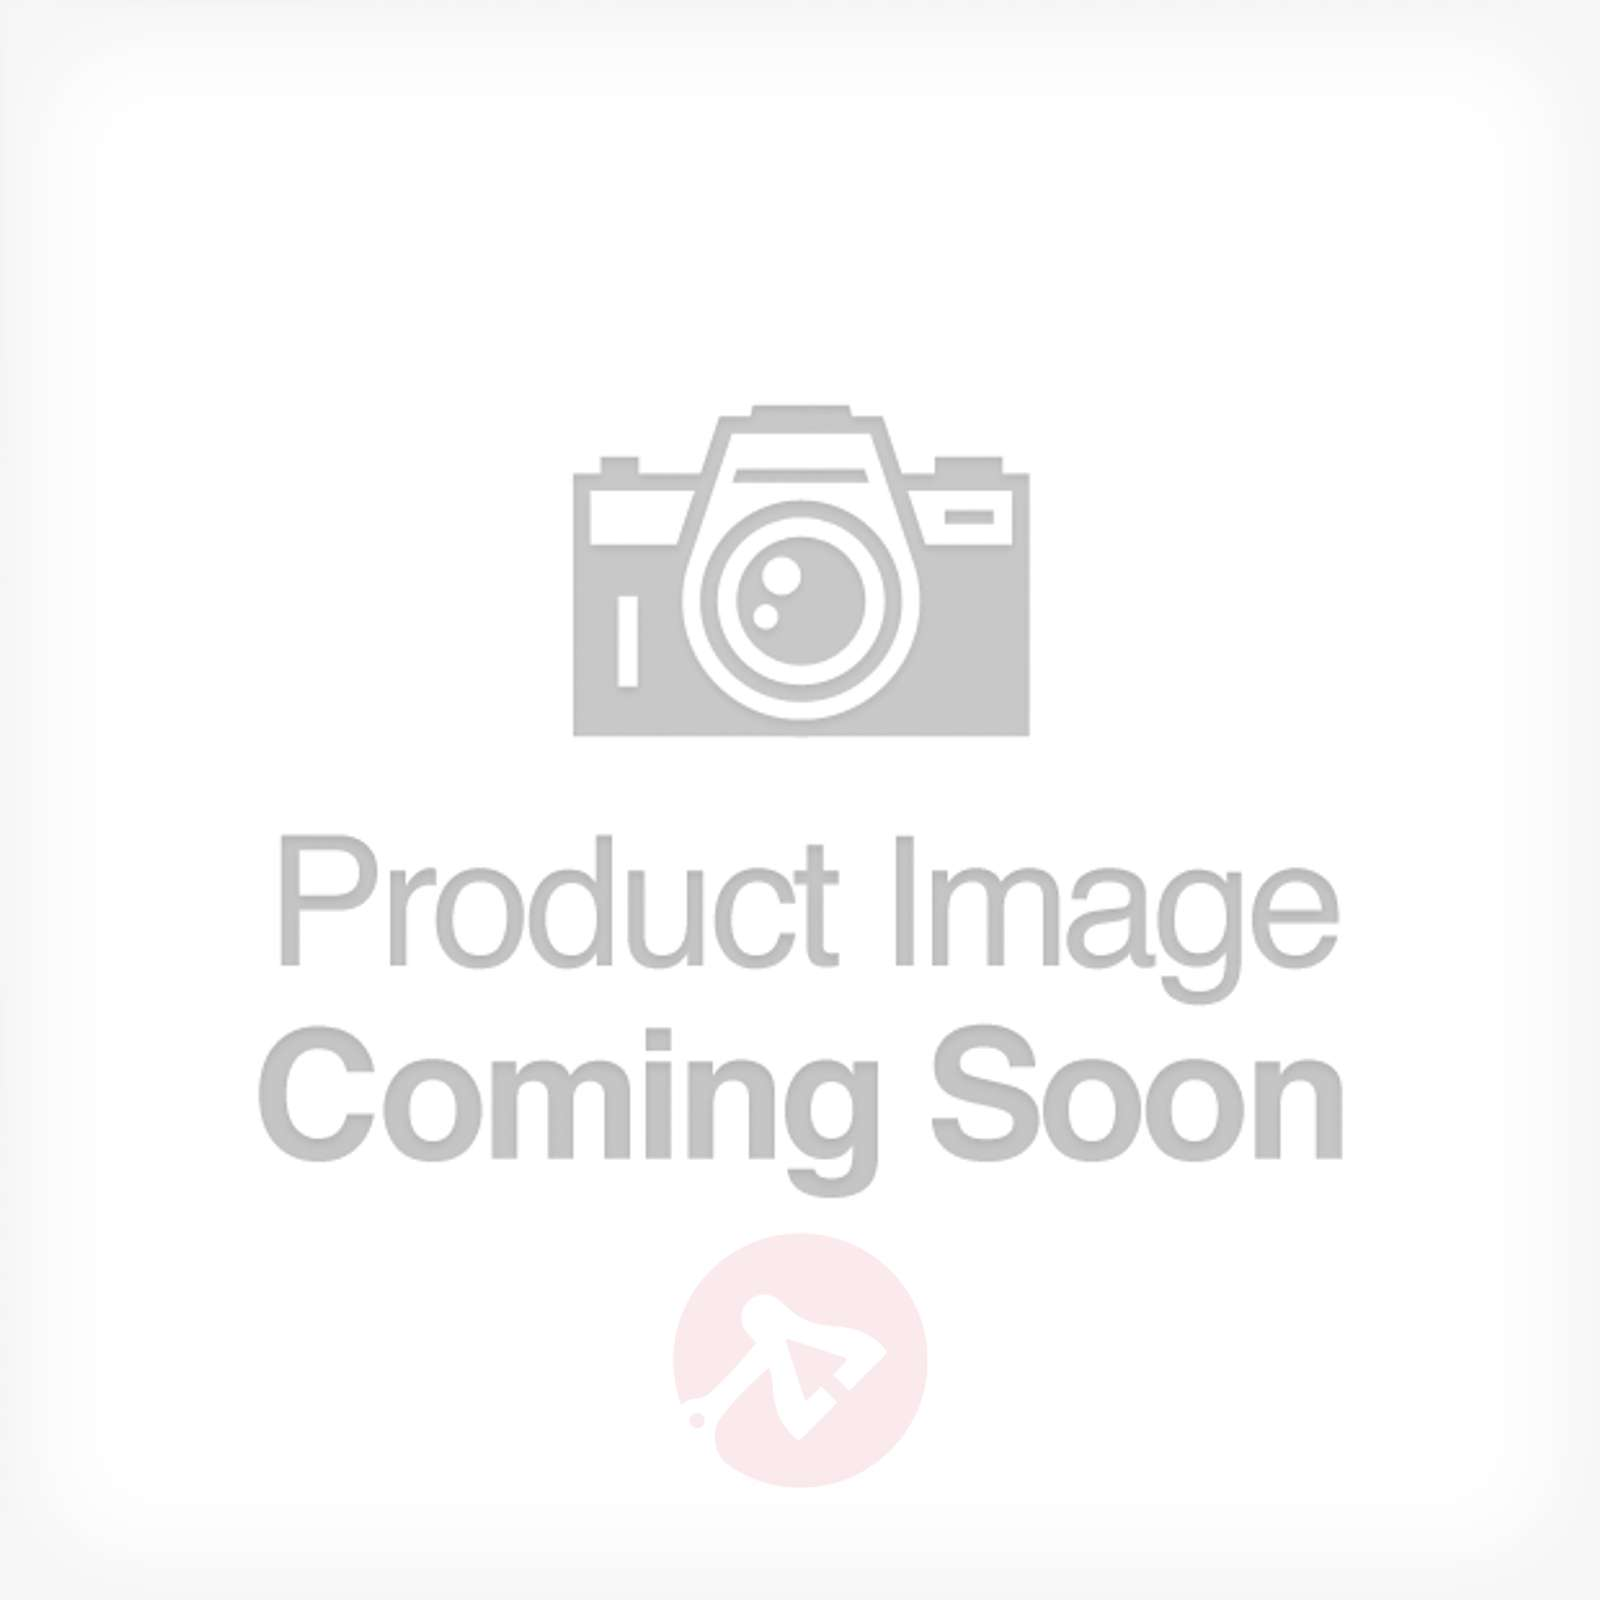 Moderni Boxy L + LED 3033-ulkokohdevalaisin, IP53-2520058X-01